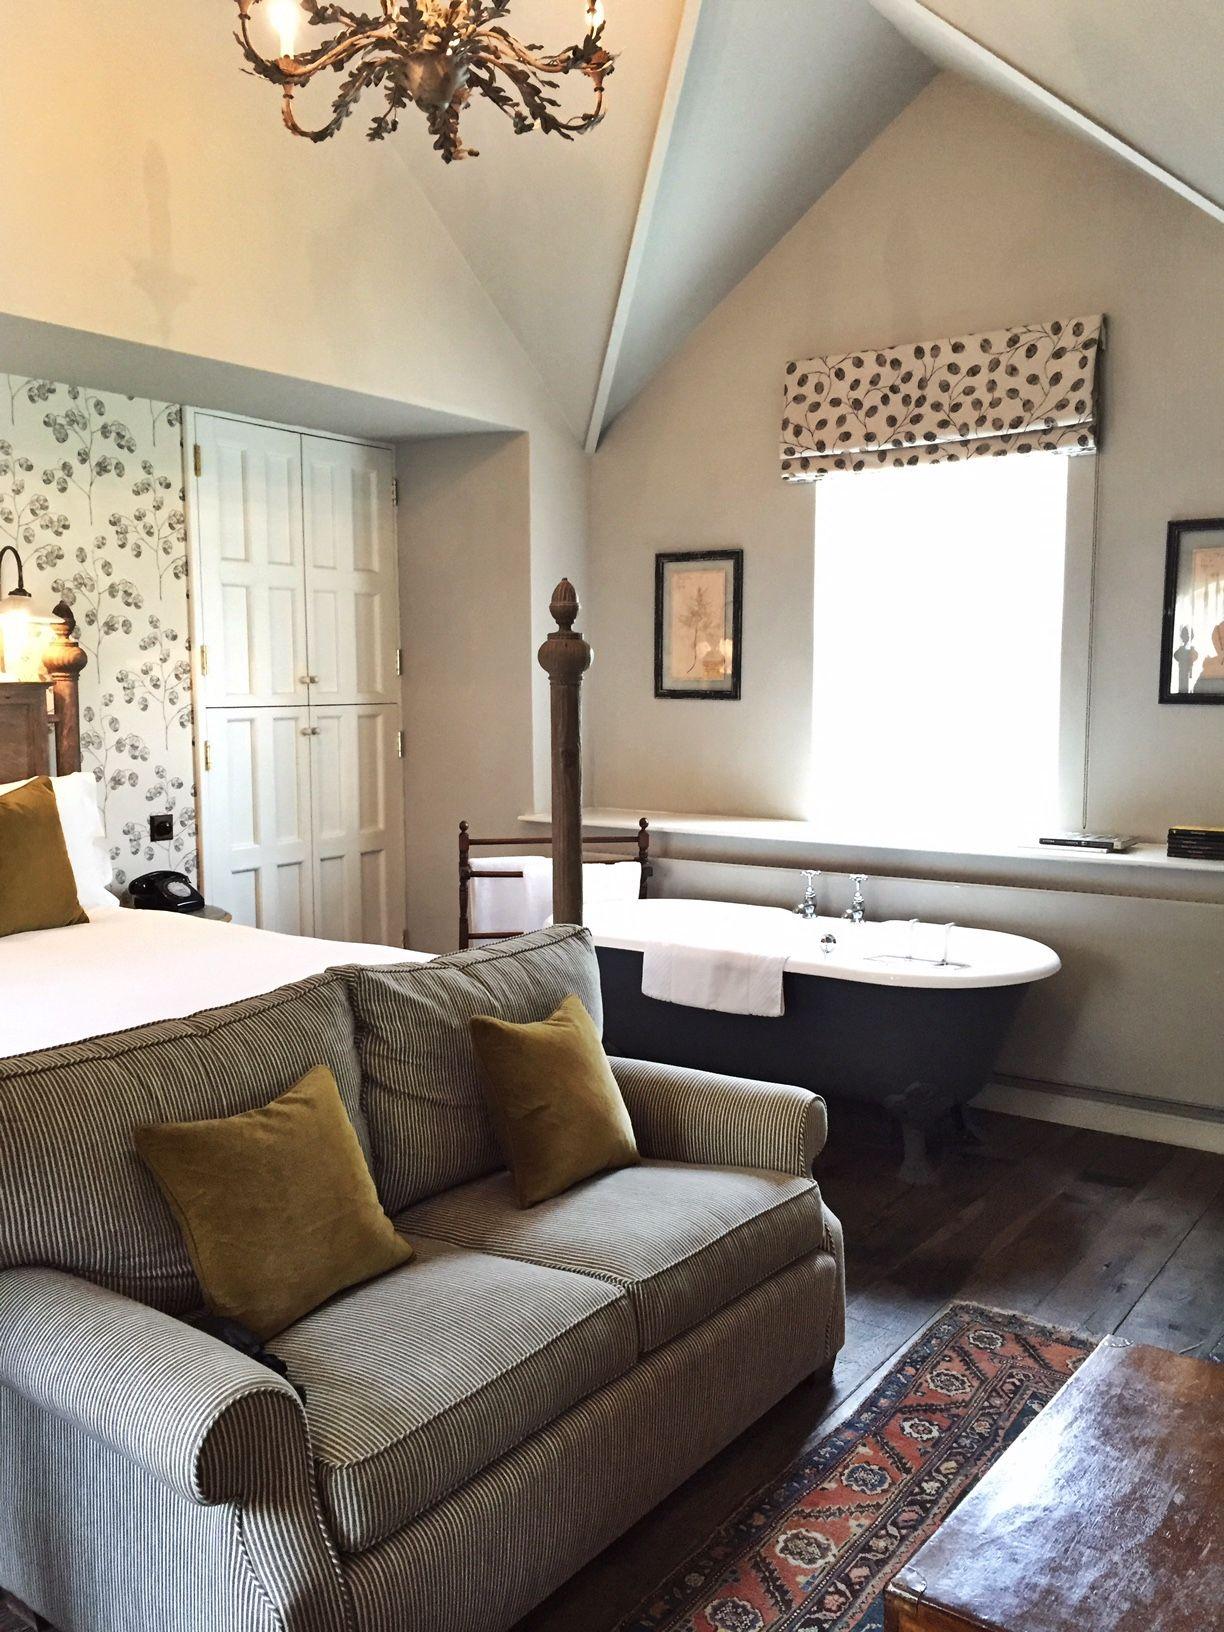 17+ Freestanding bathtub in bedroom ideas in 2021